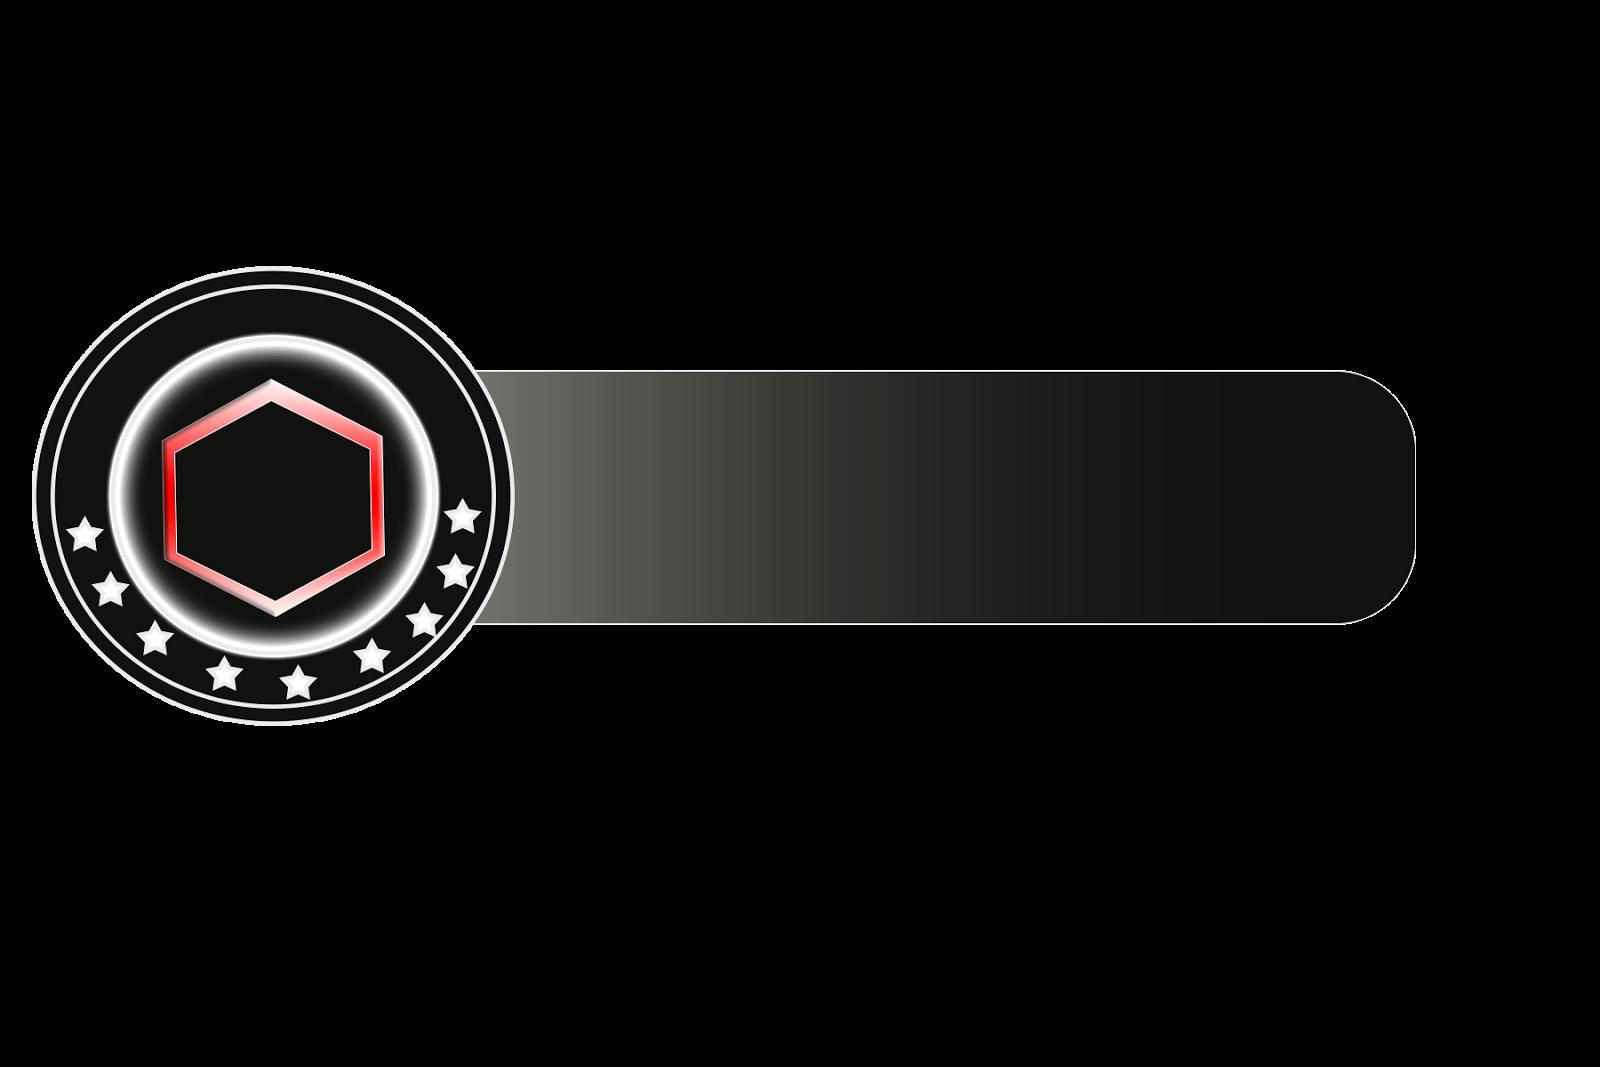 professional blank logo png free download 2018 edits4u com